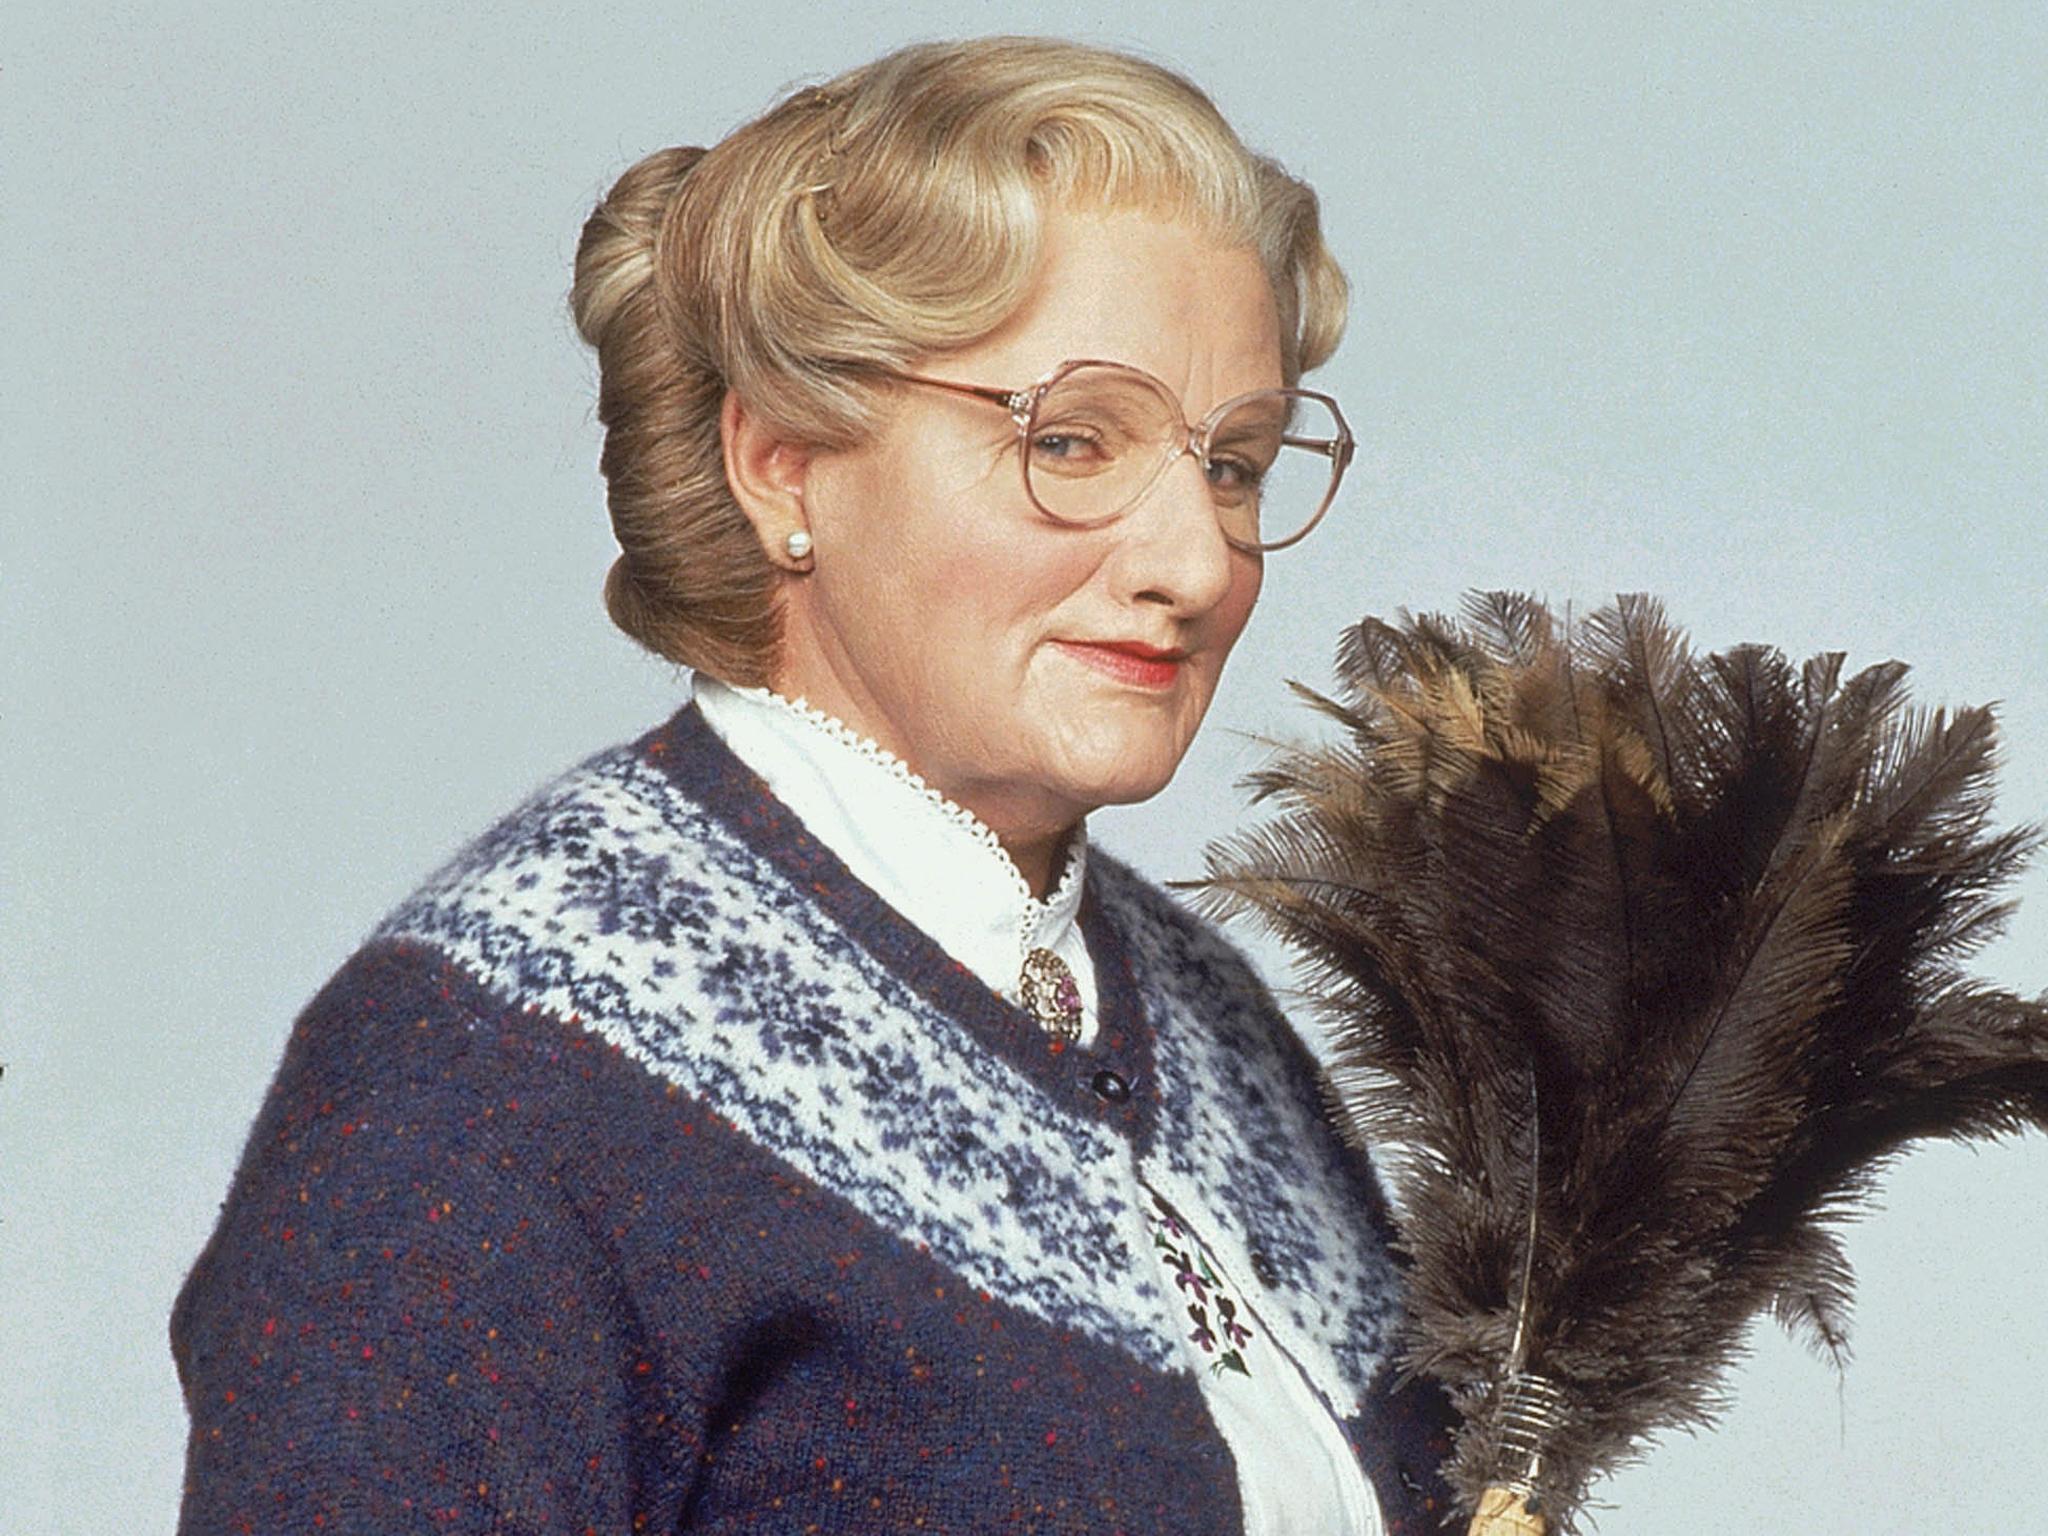 Mrs Doubtfire (1993)